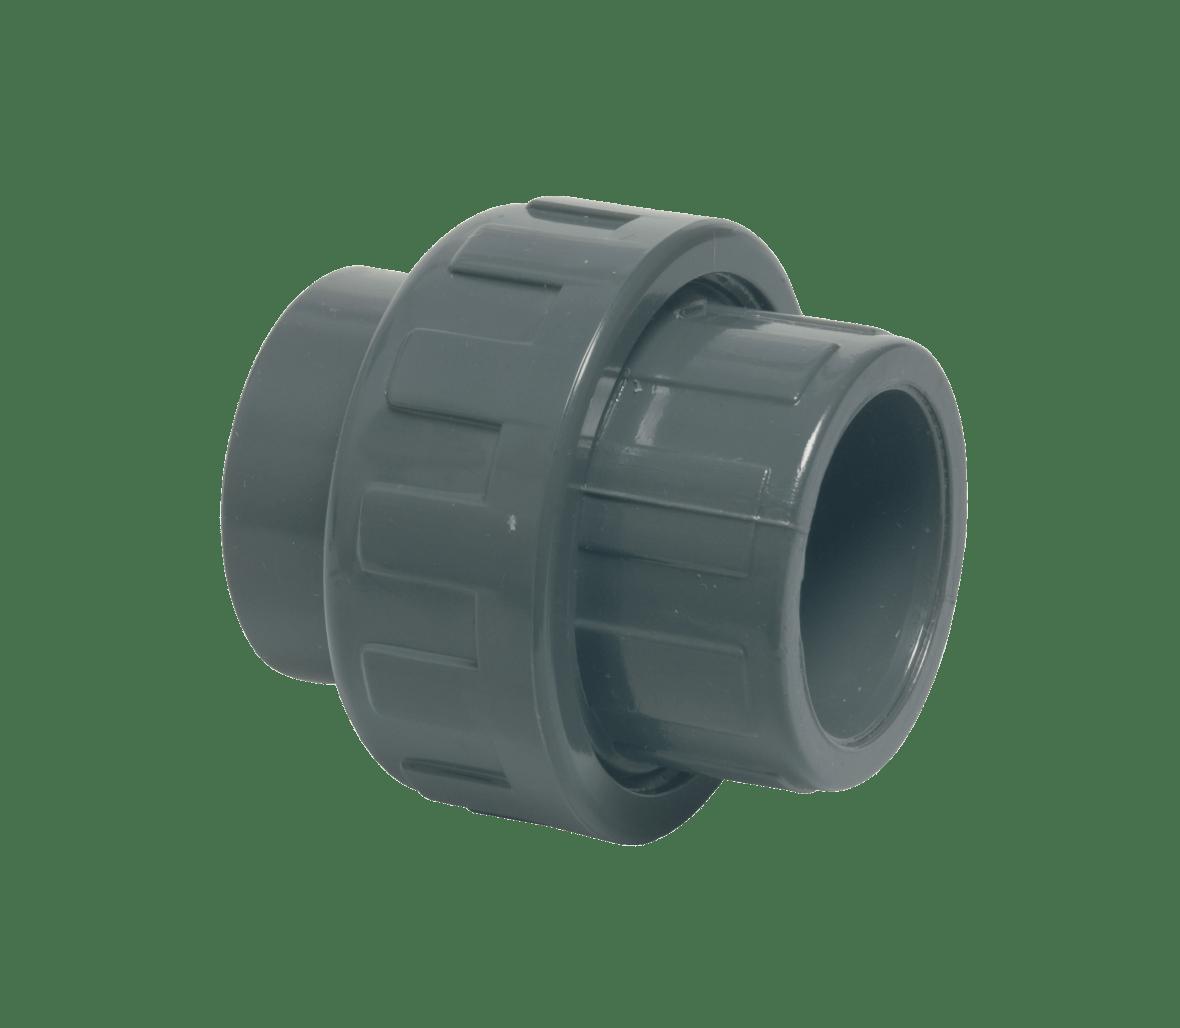 Raccord union 3/3 en PVC rigide de 63 mm de diamètre